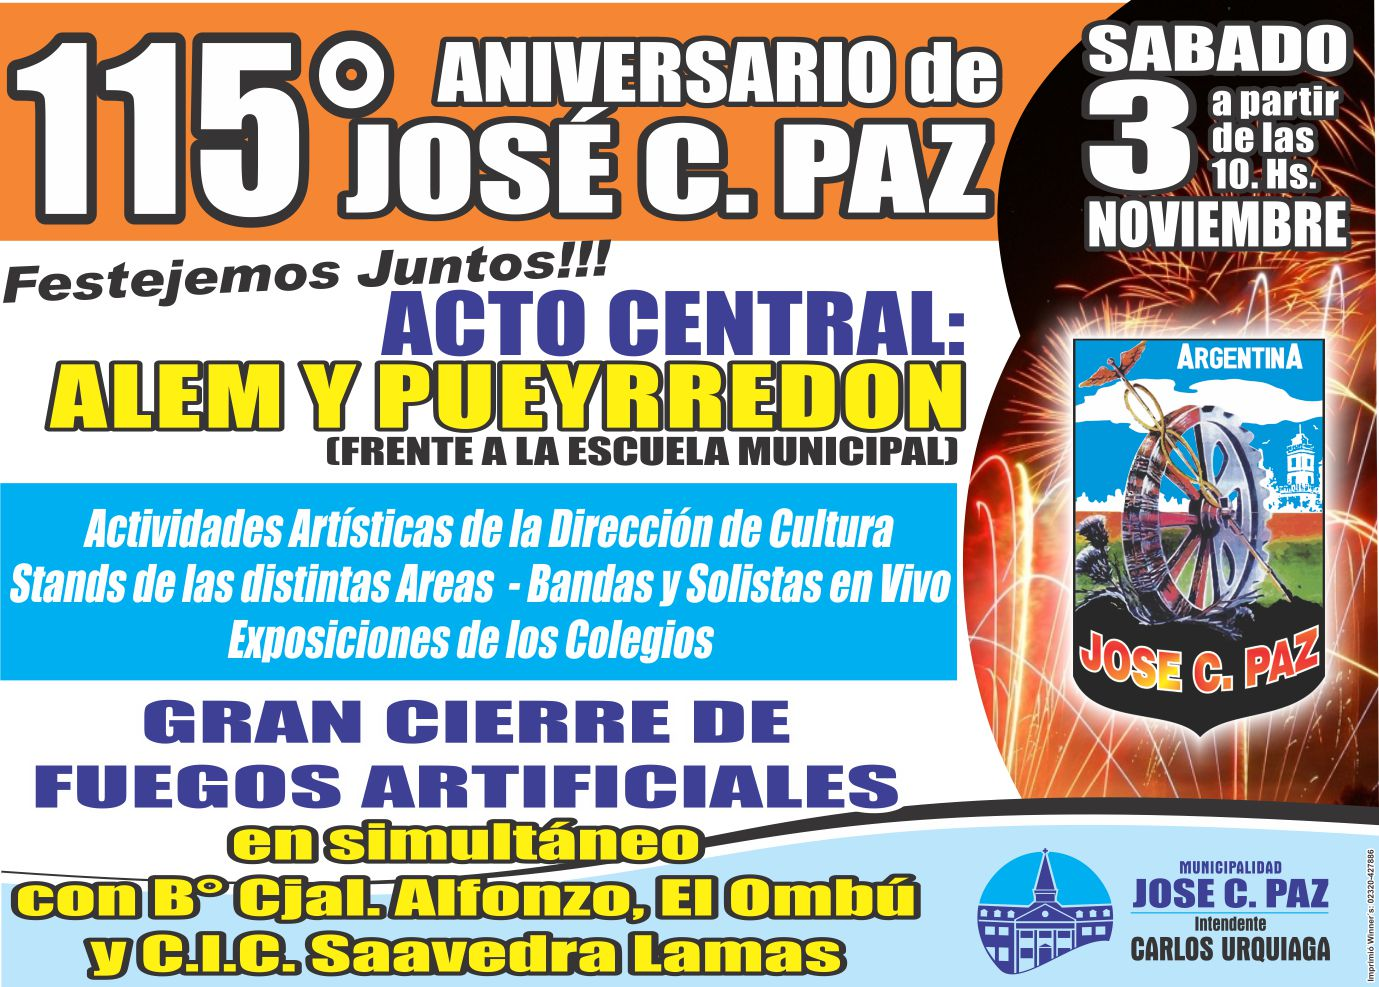 Prensa Municipalidad Jos C Paz 11 01 2012 12 01 2012